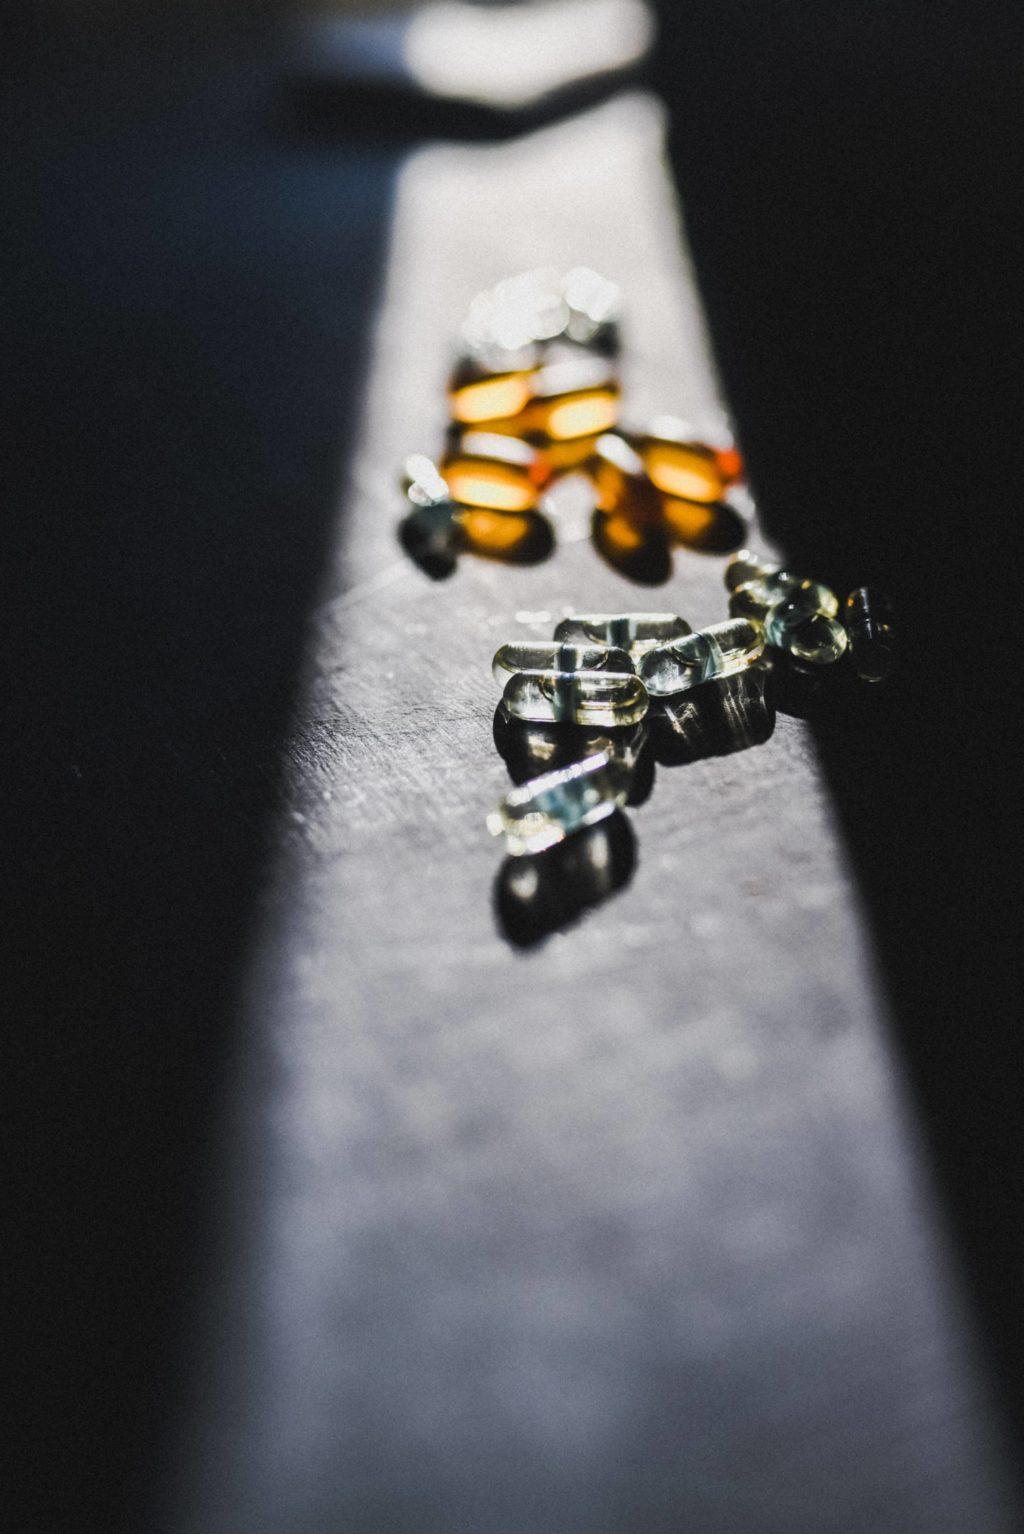 HEALTH BENEFITS OF VITAMIN E SUPPLEMENT